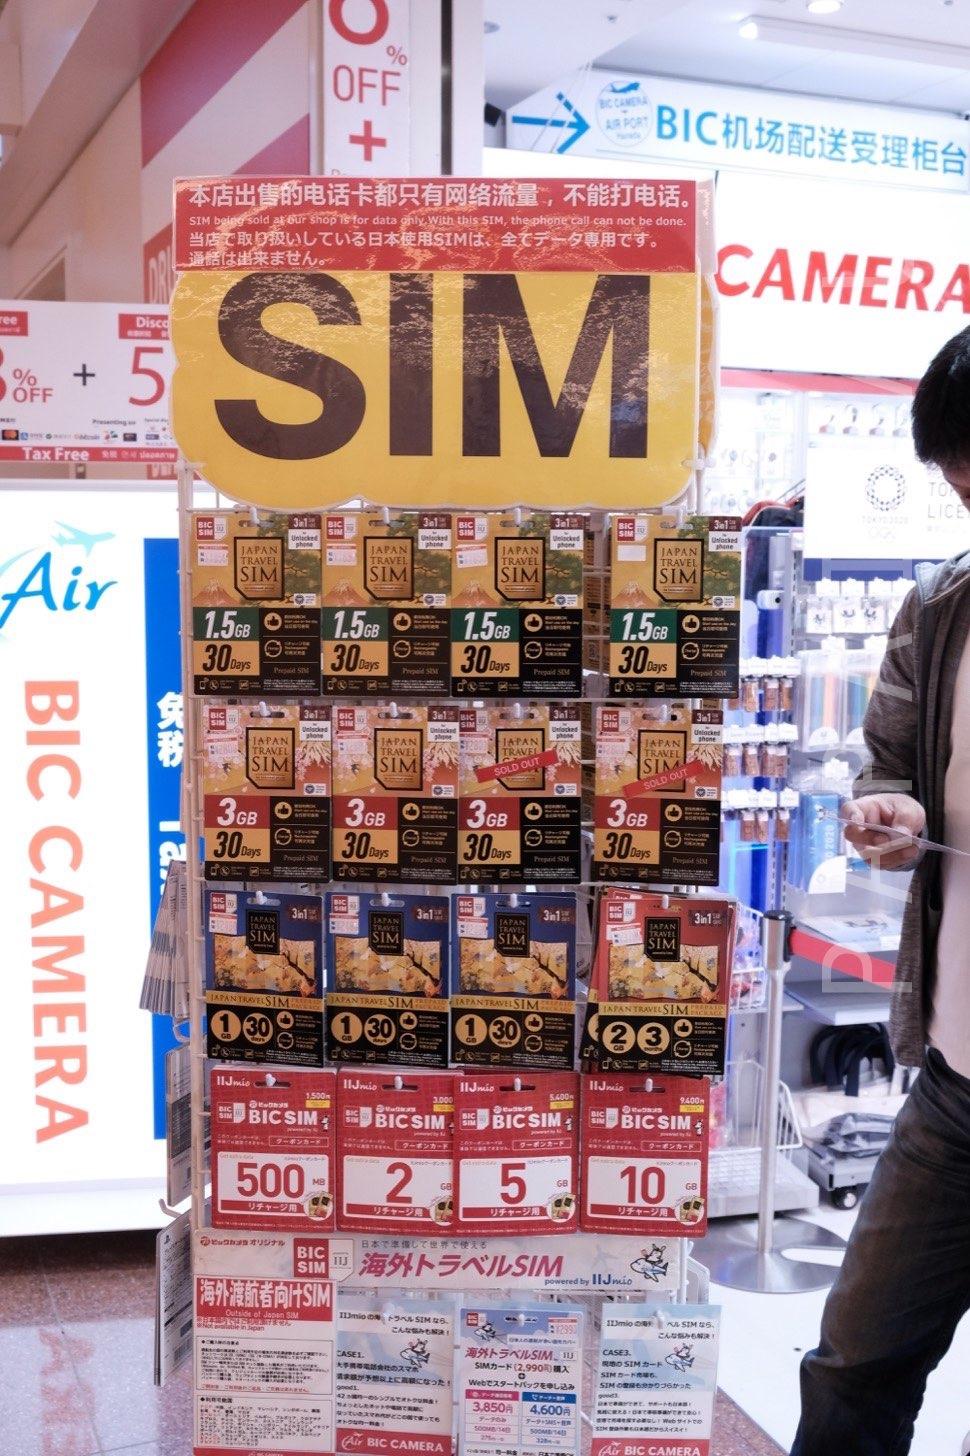 Air Big Camera店先で販売されているプリペイドSIM